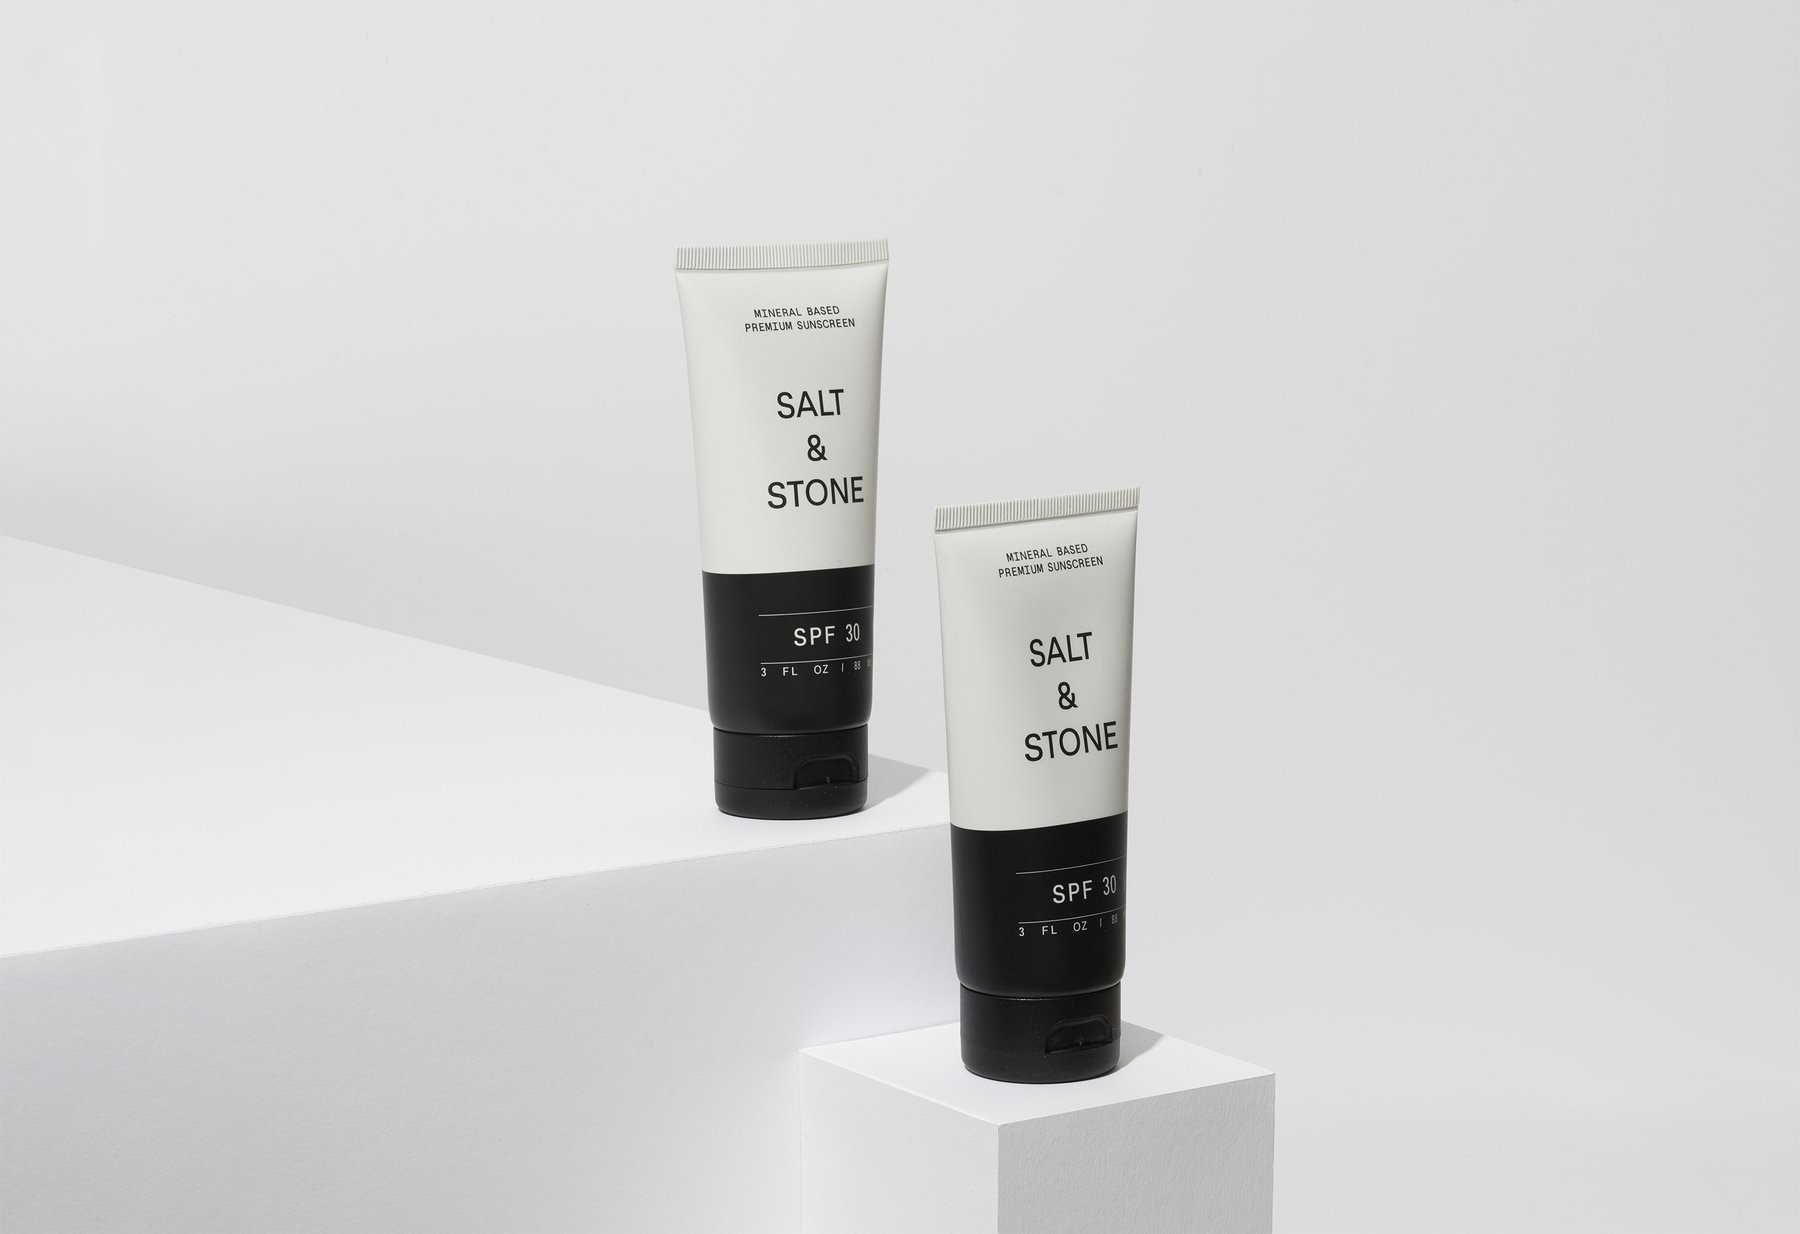 SALT&STONE 夏に備えるUVシリーズ